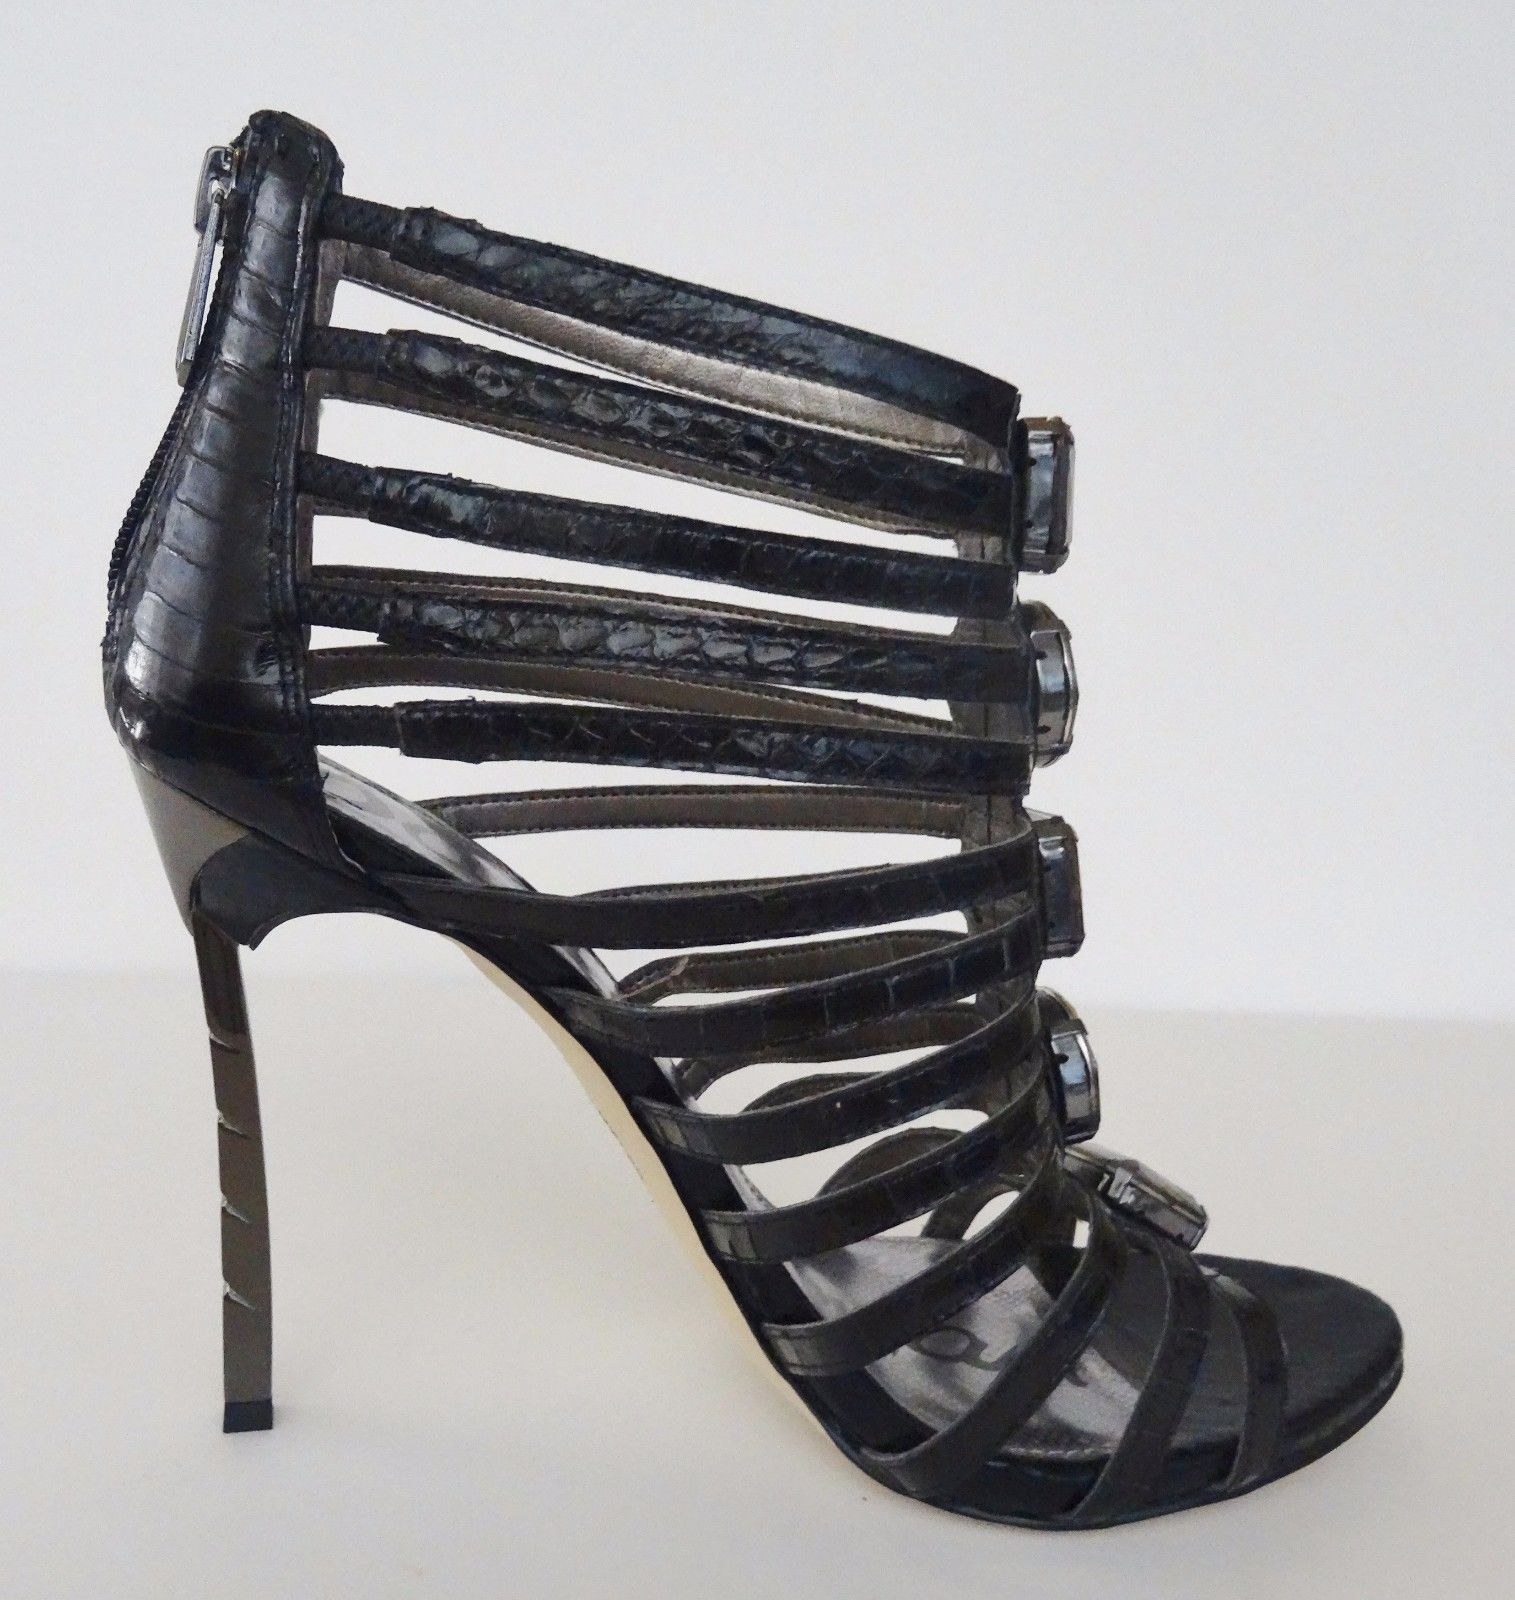 NIB Sam Sam NIB Edelman Hampton Ankle Caged Sandale and similar items c753d1